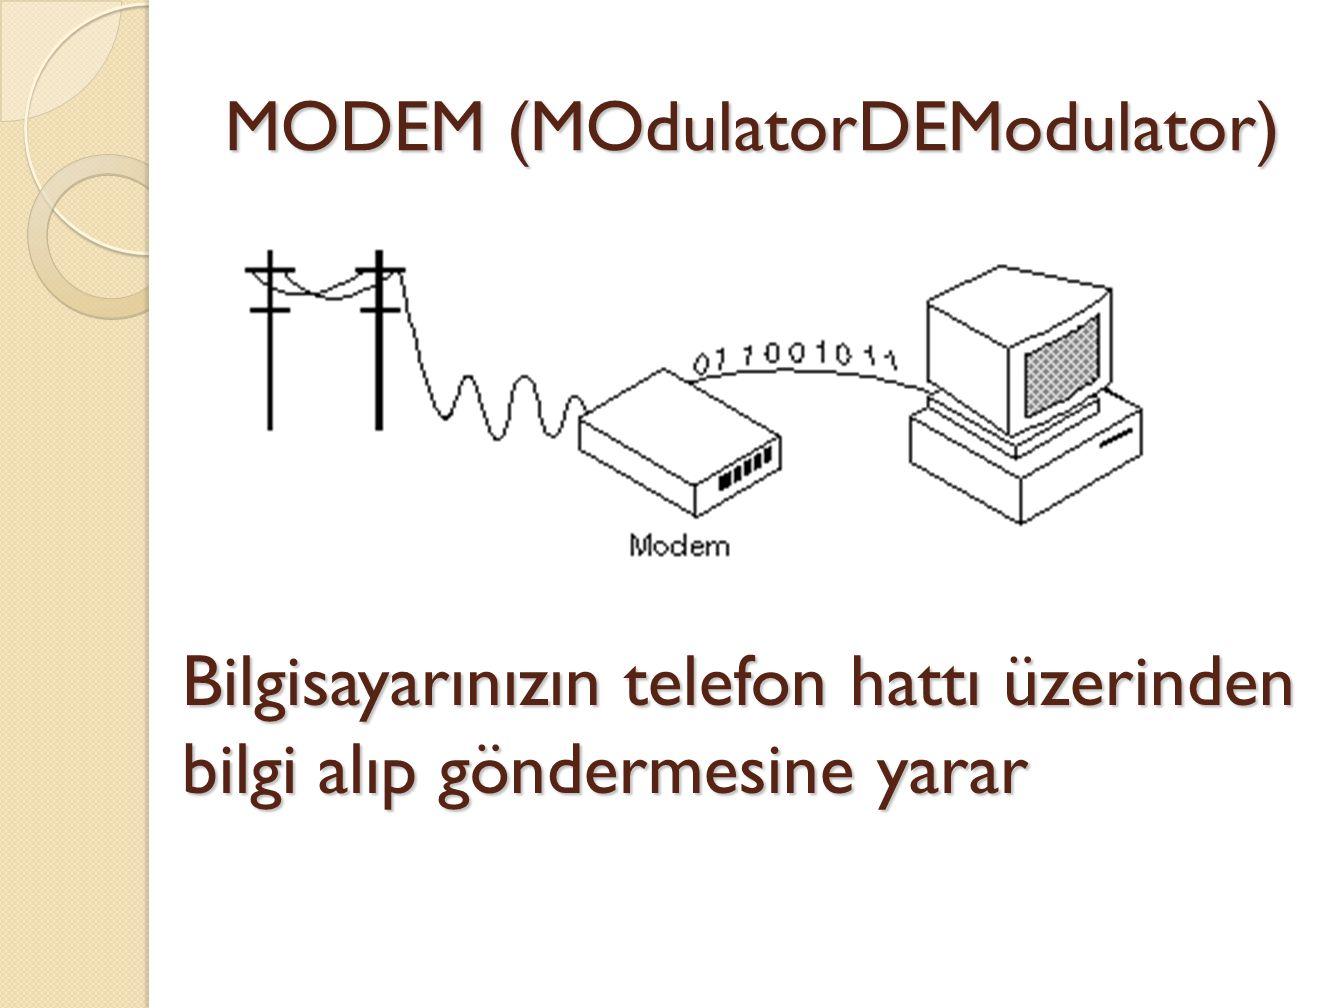 MODEM (MOdulatorDEModulator)